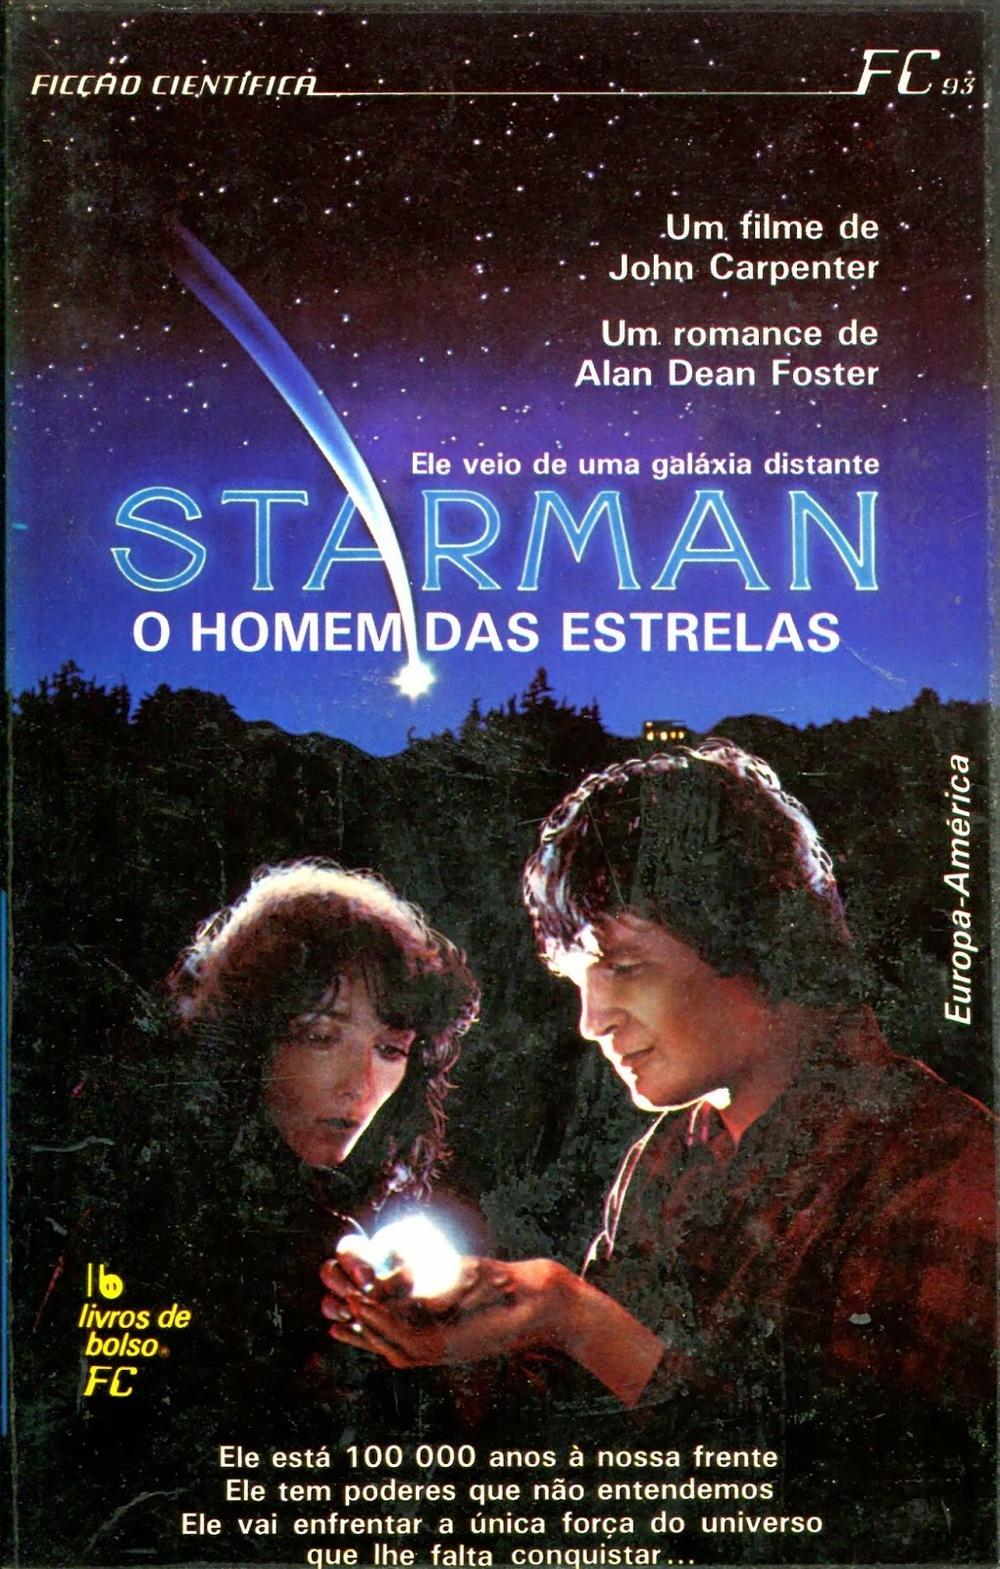 93 - Starman.jpg